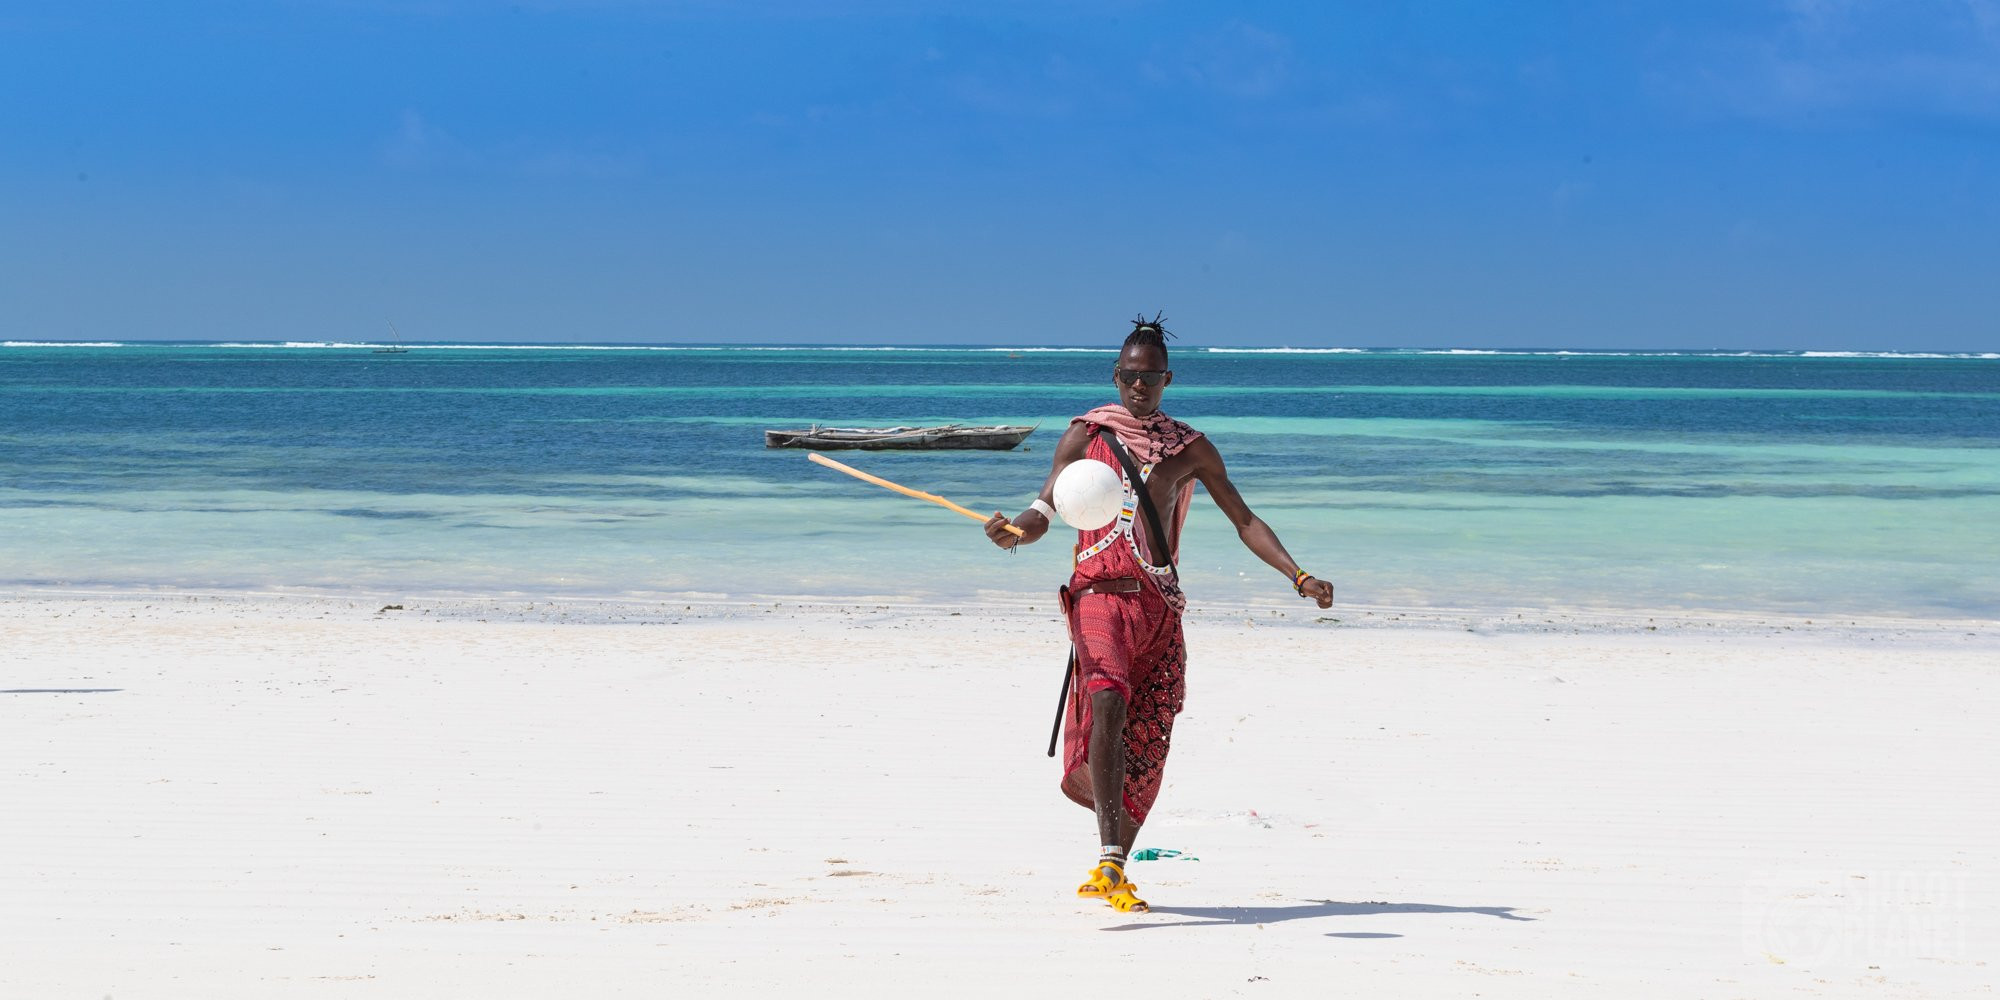 Kiwengwa beach soccer player Zanzibar Tanzania